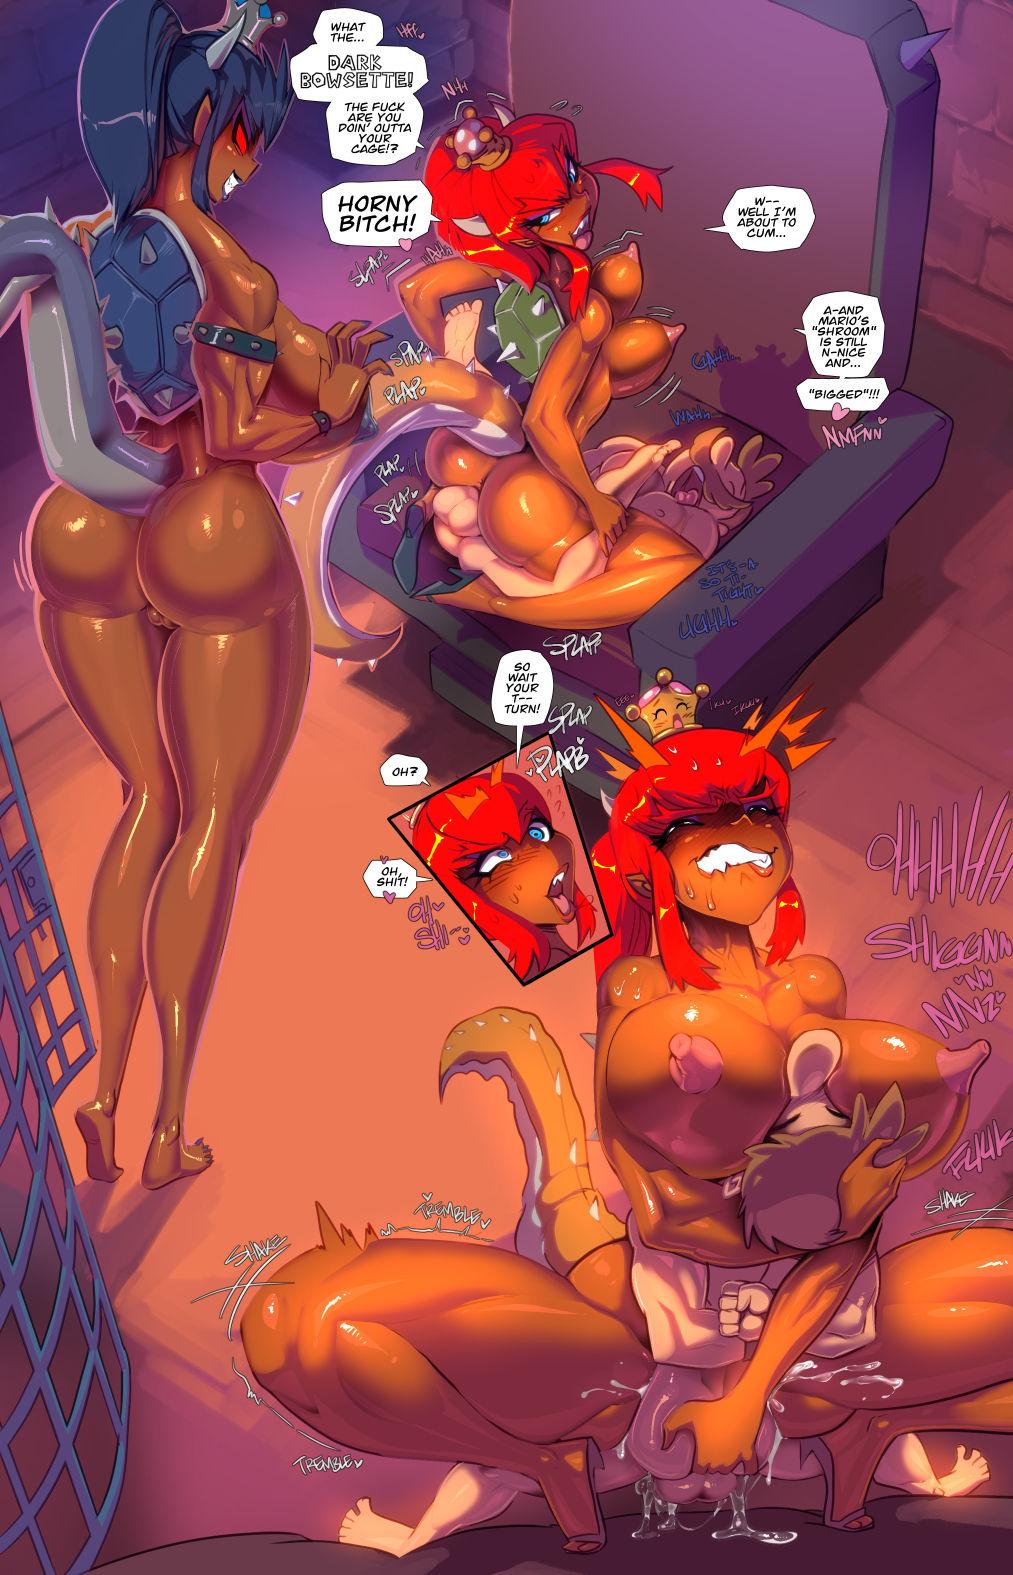 Bowsette's Bondage Bastille porn comics Masturbation, BDSM, Best, Blowjob, Cum Shots, cunnilingus, Femdom, Group Sex, Kidnapping, Lesbians, Monster Girls, Rule 63, Straight, Submission, Titfuck